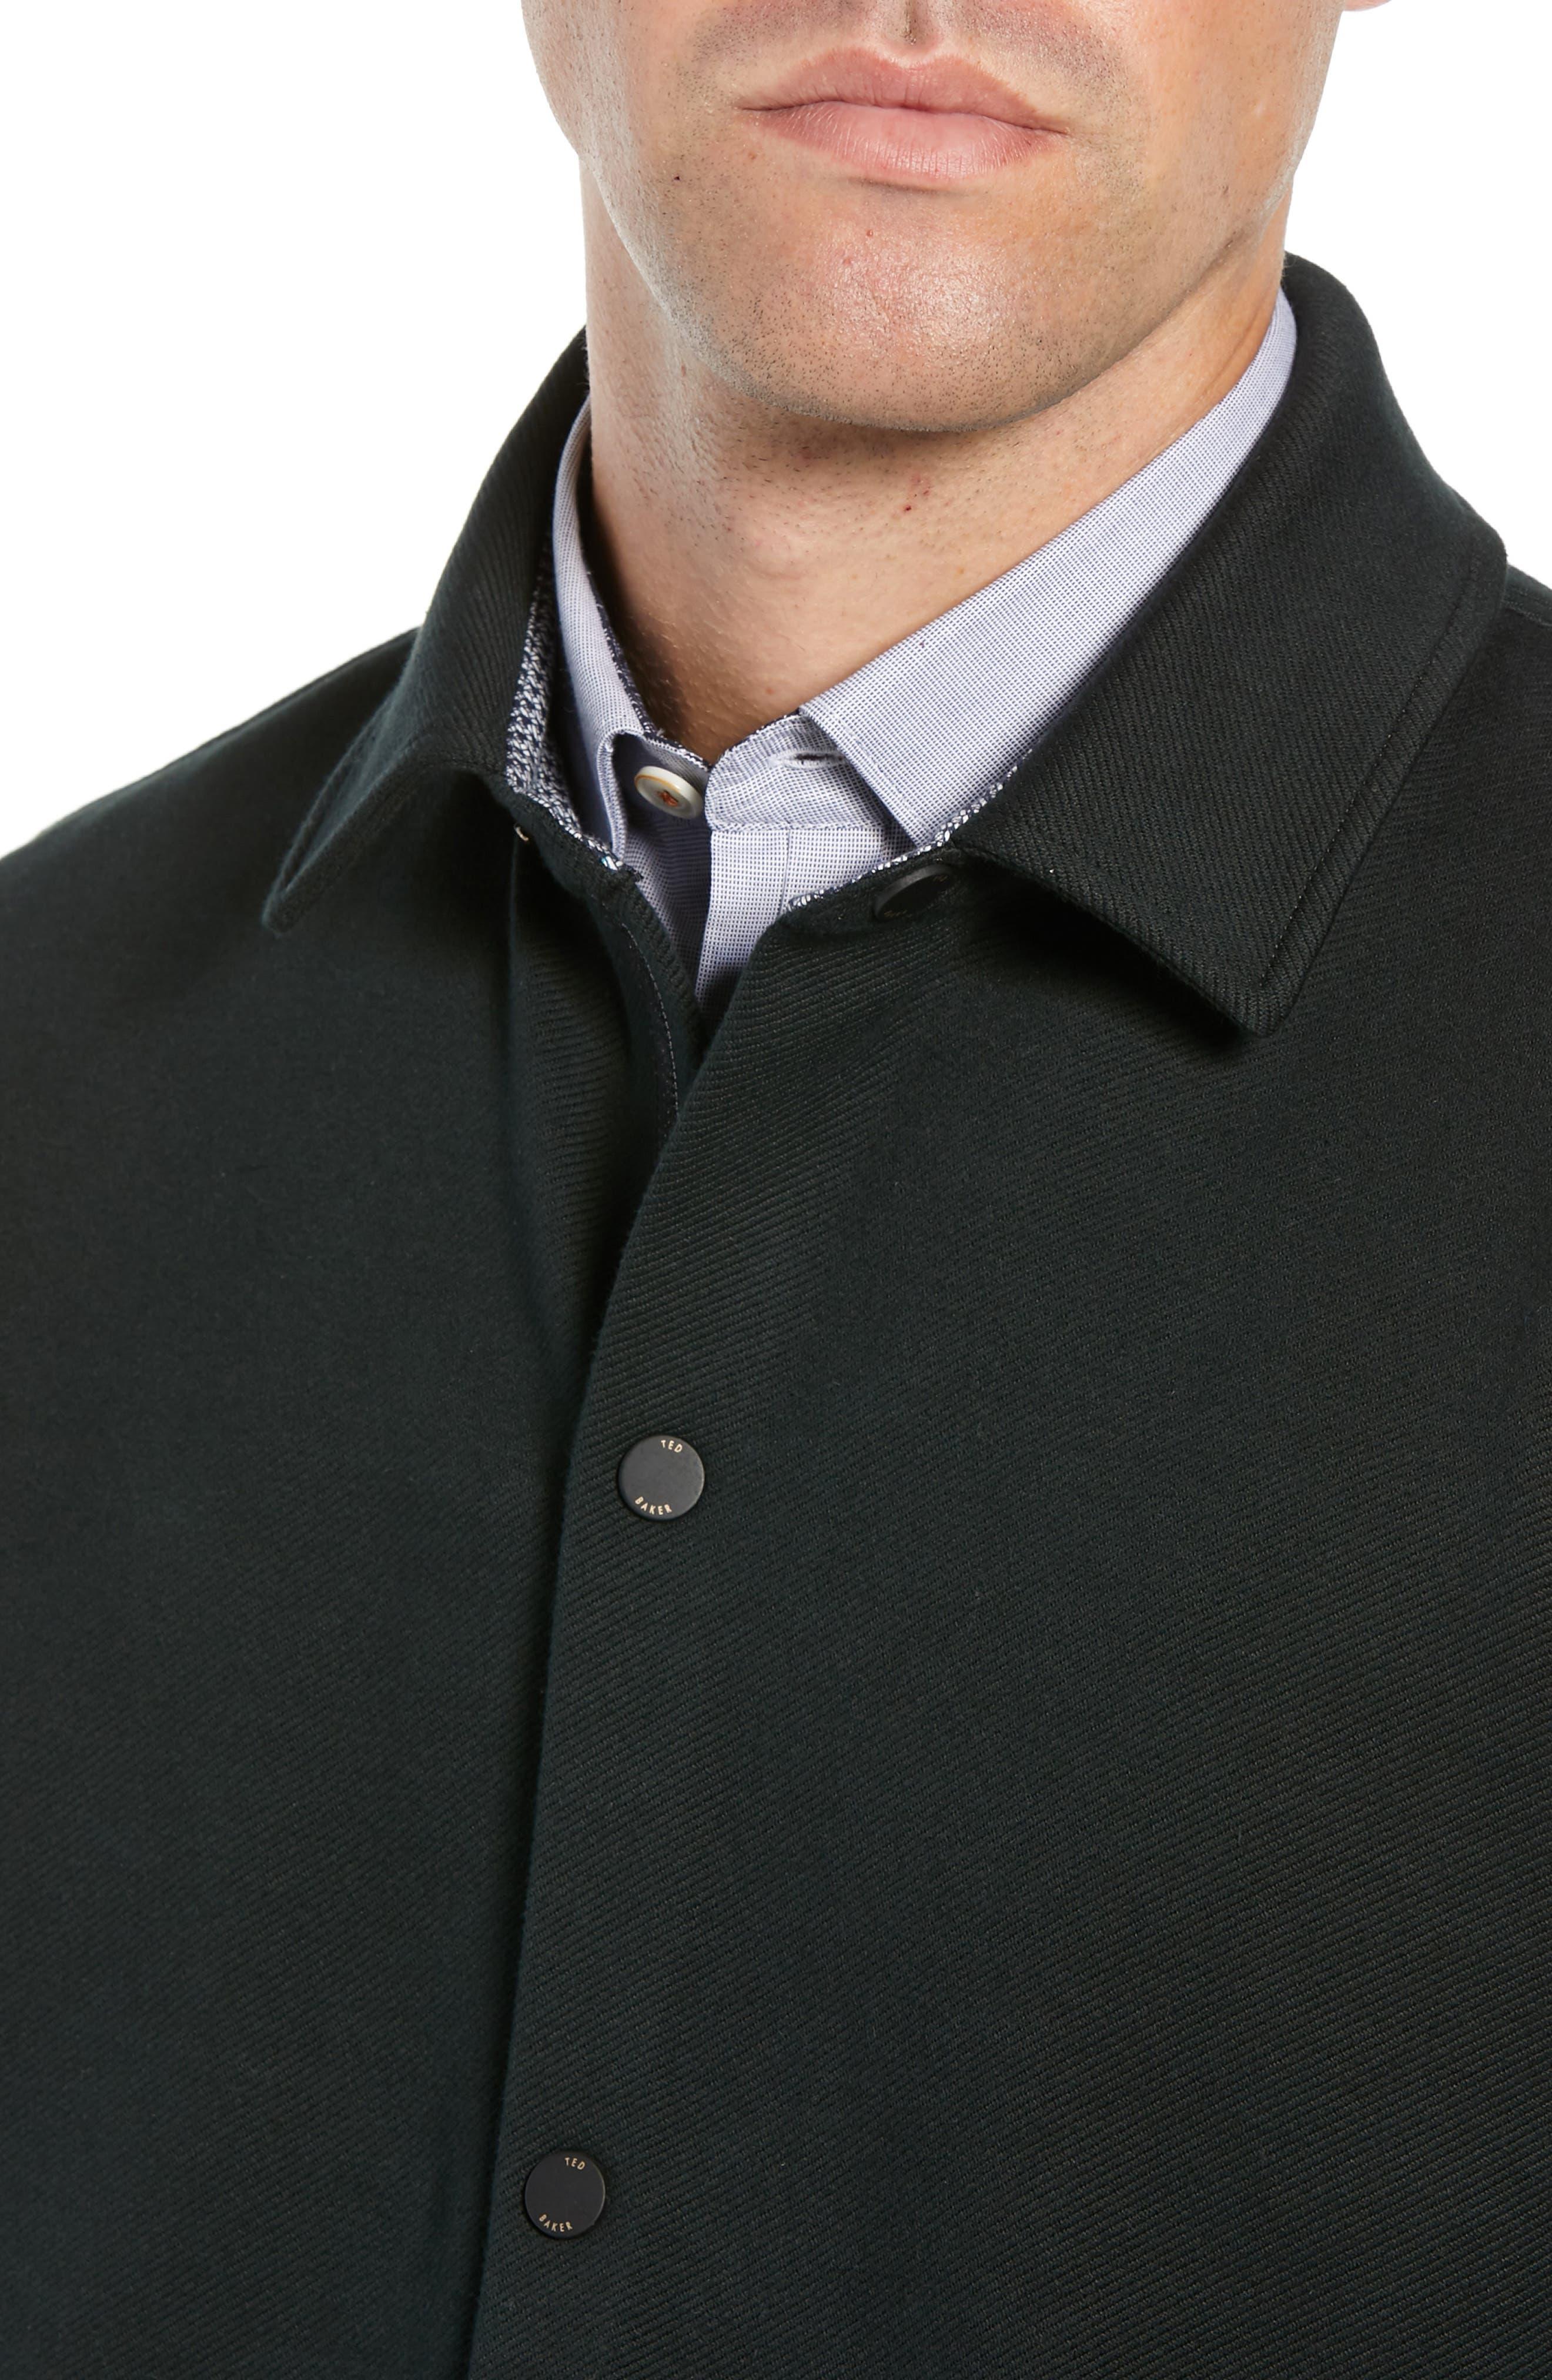 Danett Tall Twill Jacket,                             Alternate thumbnail 4, color,                             BLACK